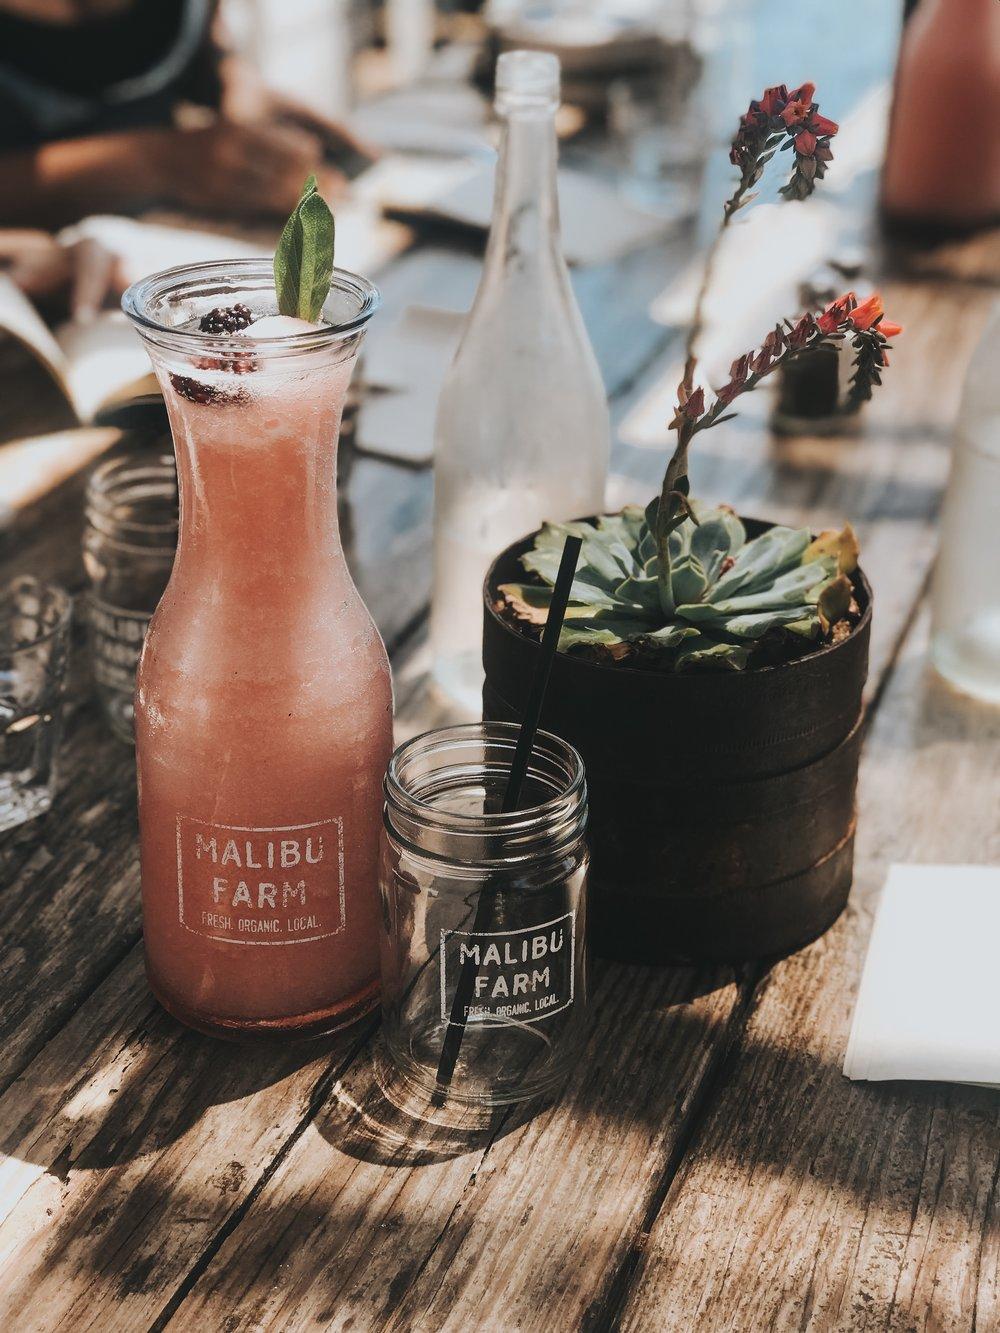 Where to eat in Malibu: Malibu Farm - Frozen Rose